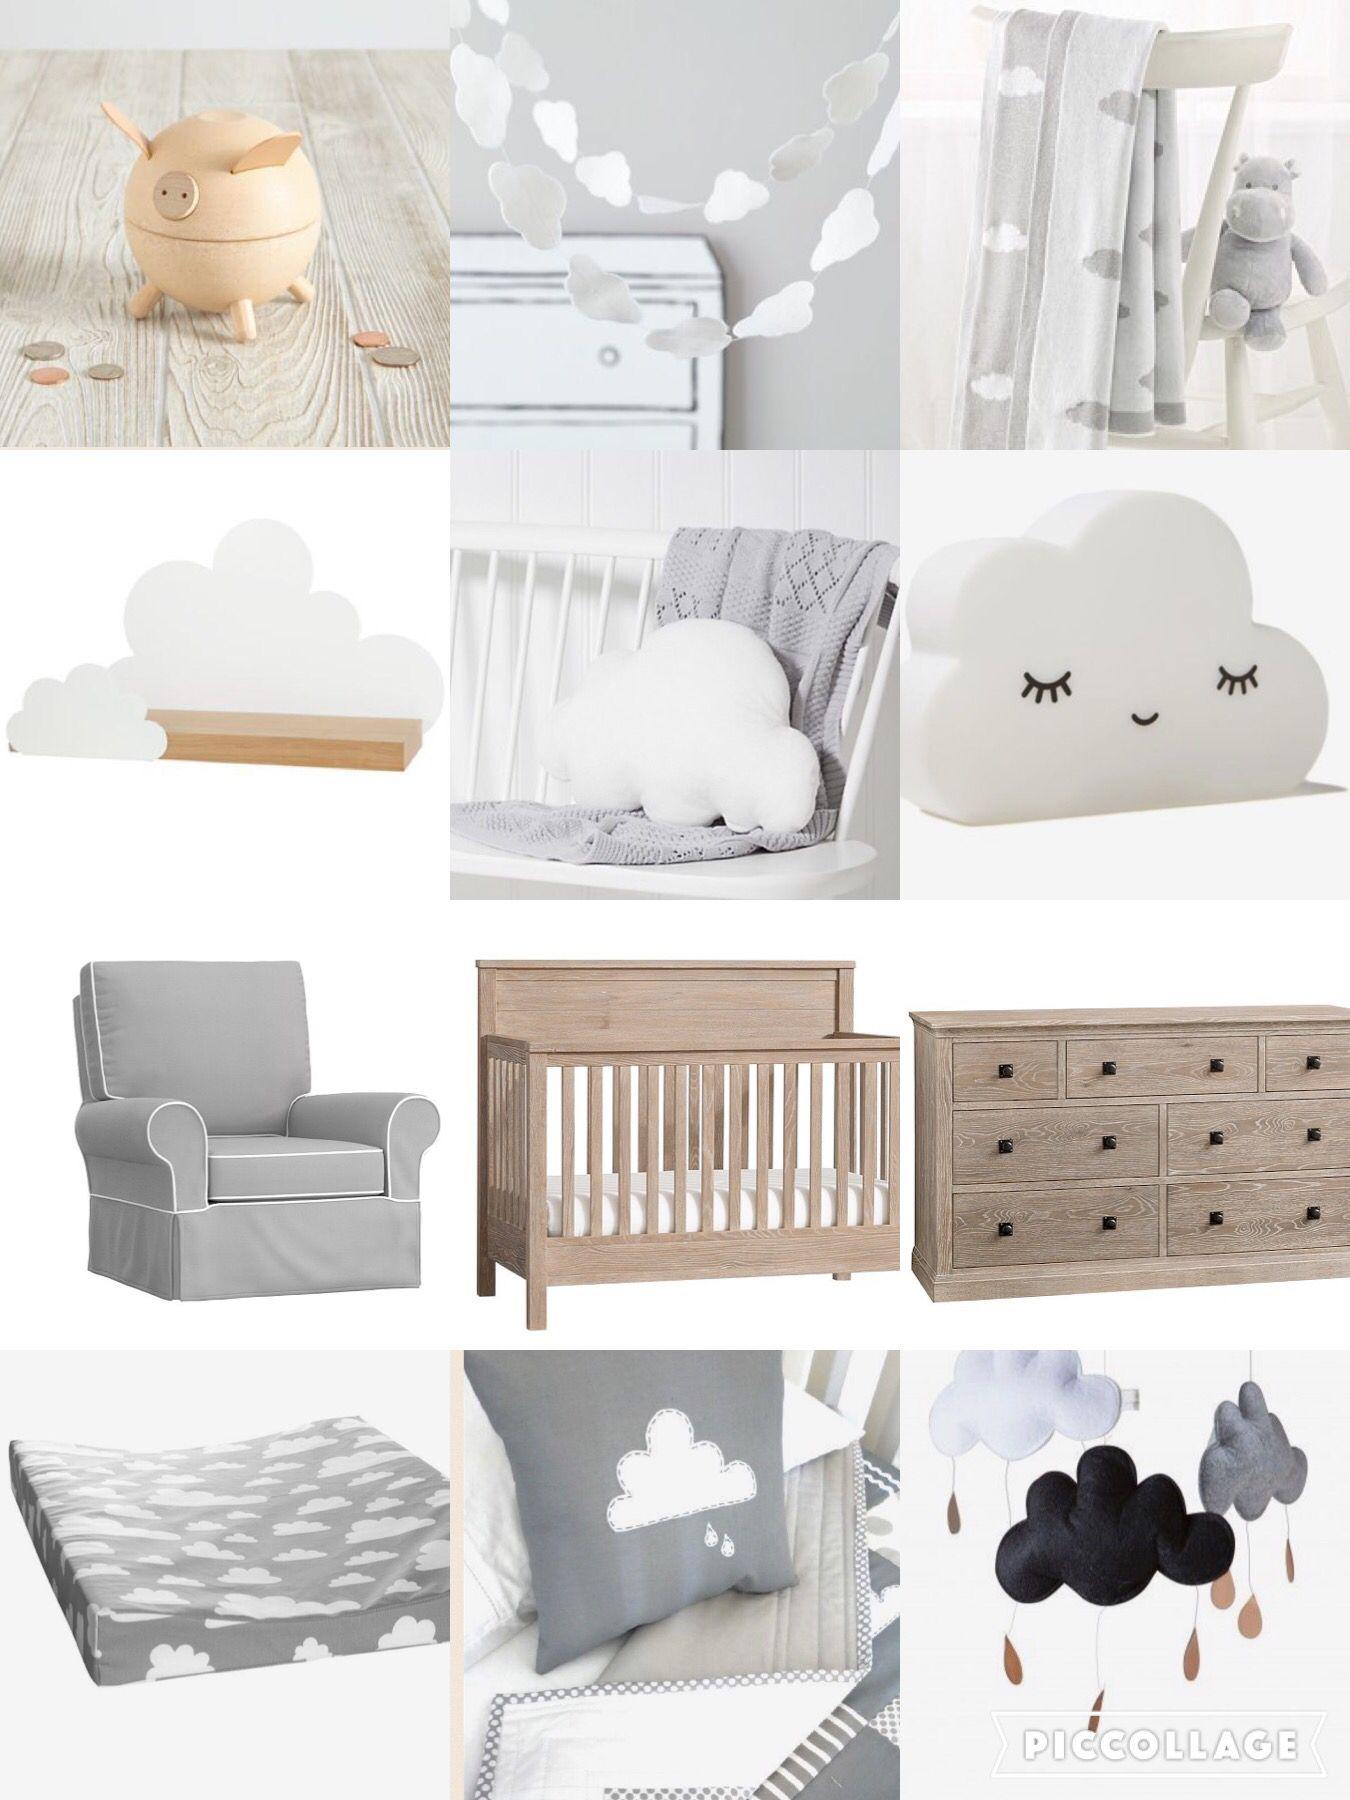 Cloud nursery theme ☁ … | secret m…